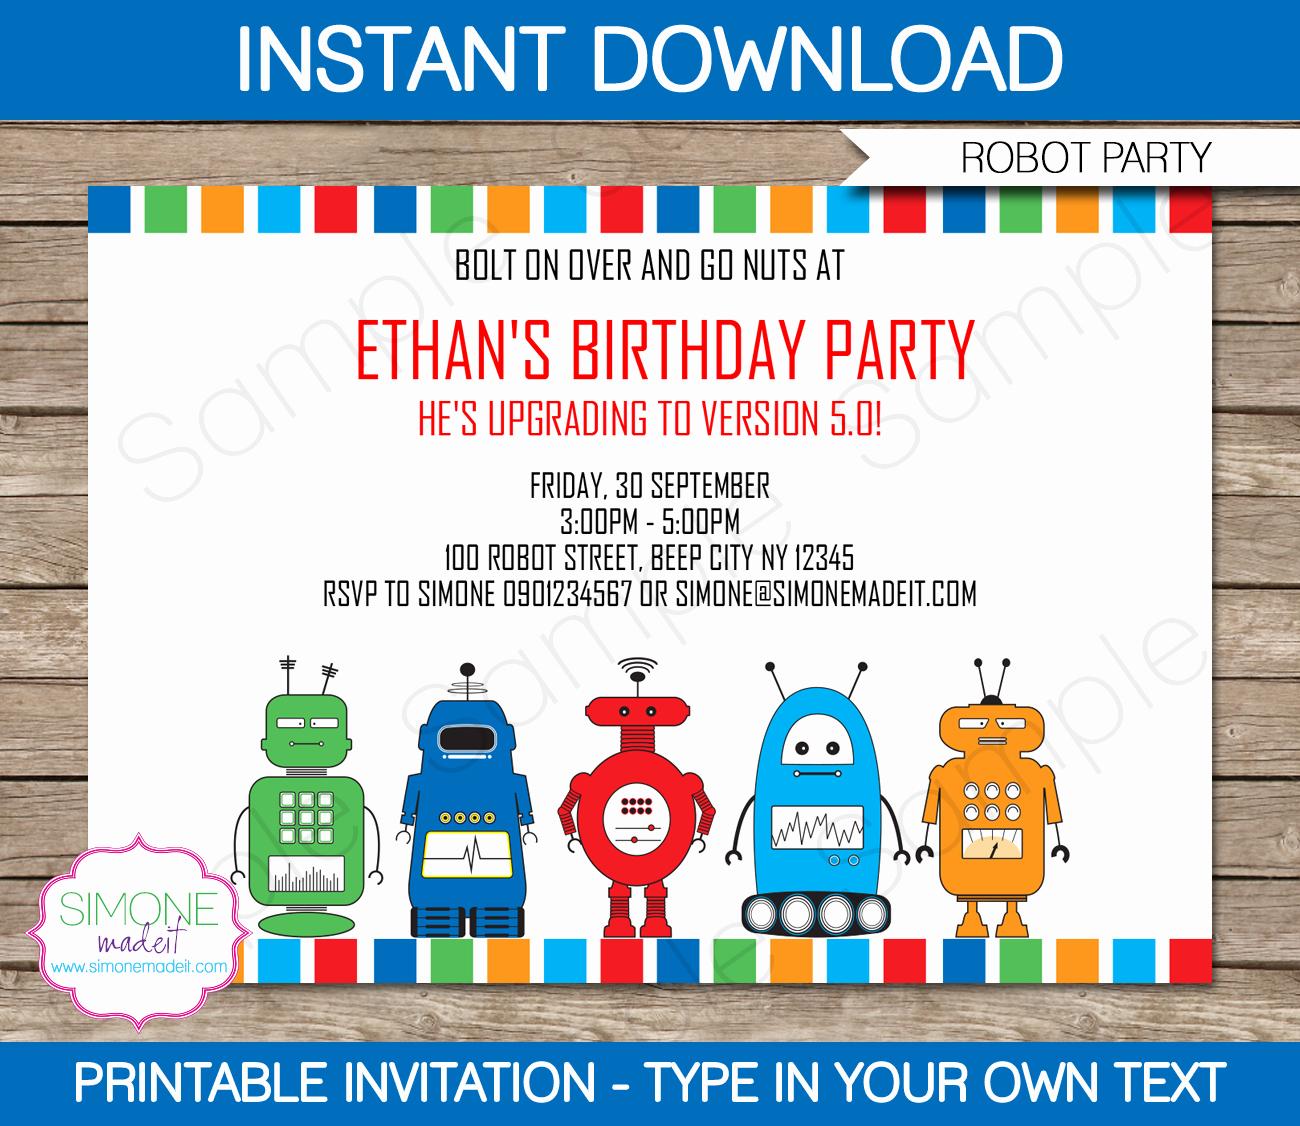 Birthday Party Invitation Template Luxury Robot Party Invitations Template